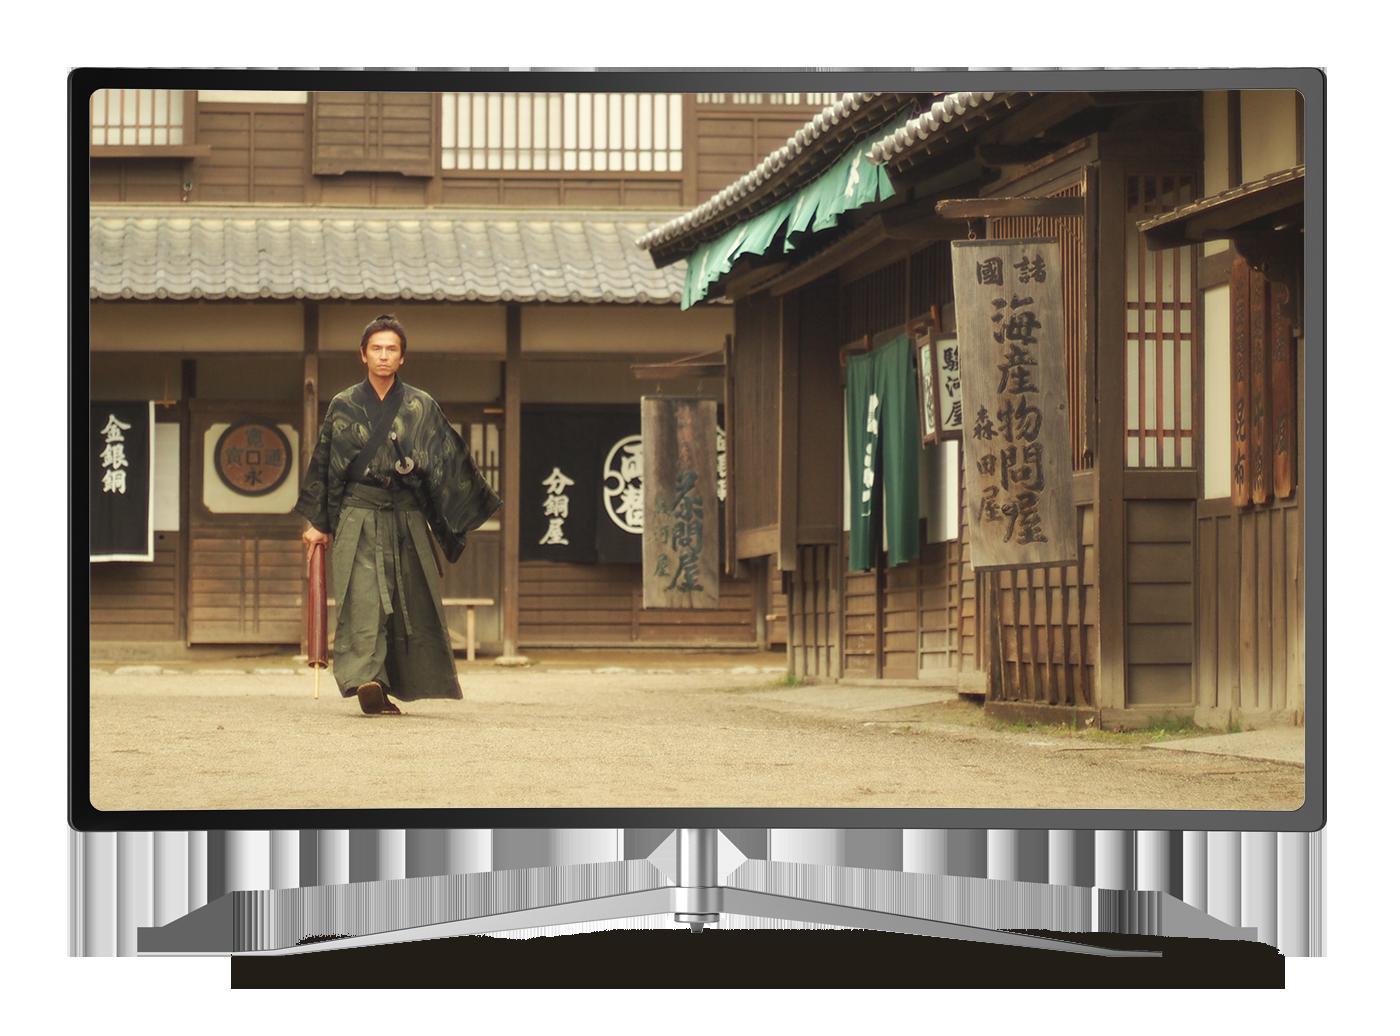 TV with movie image